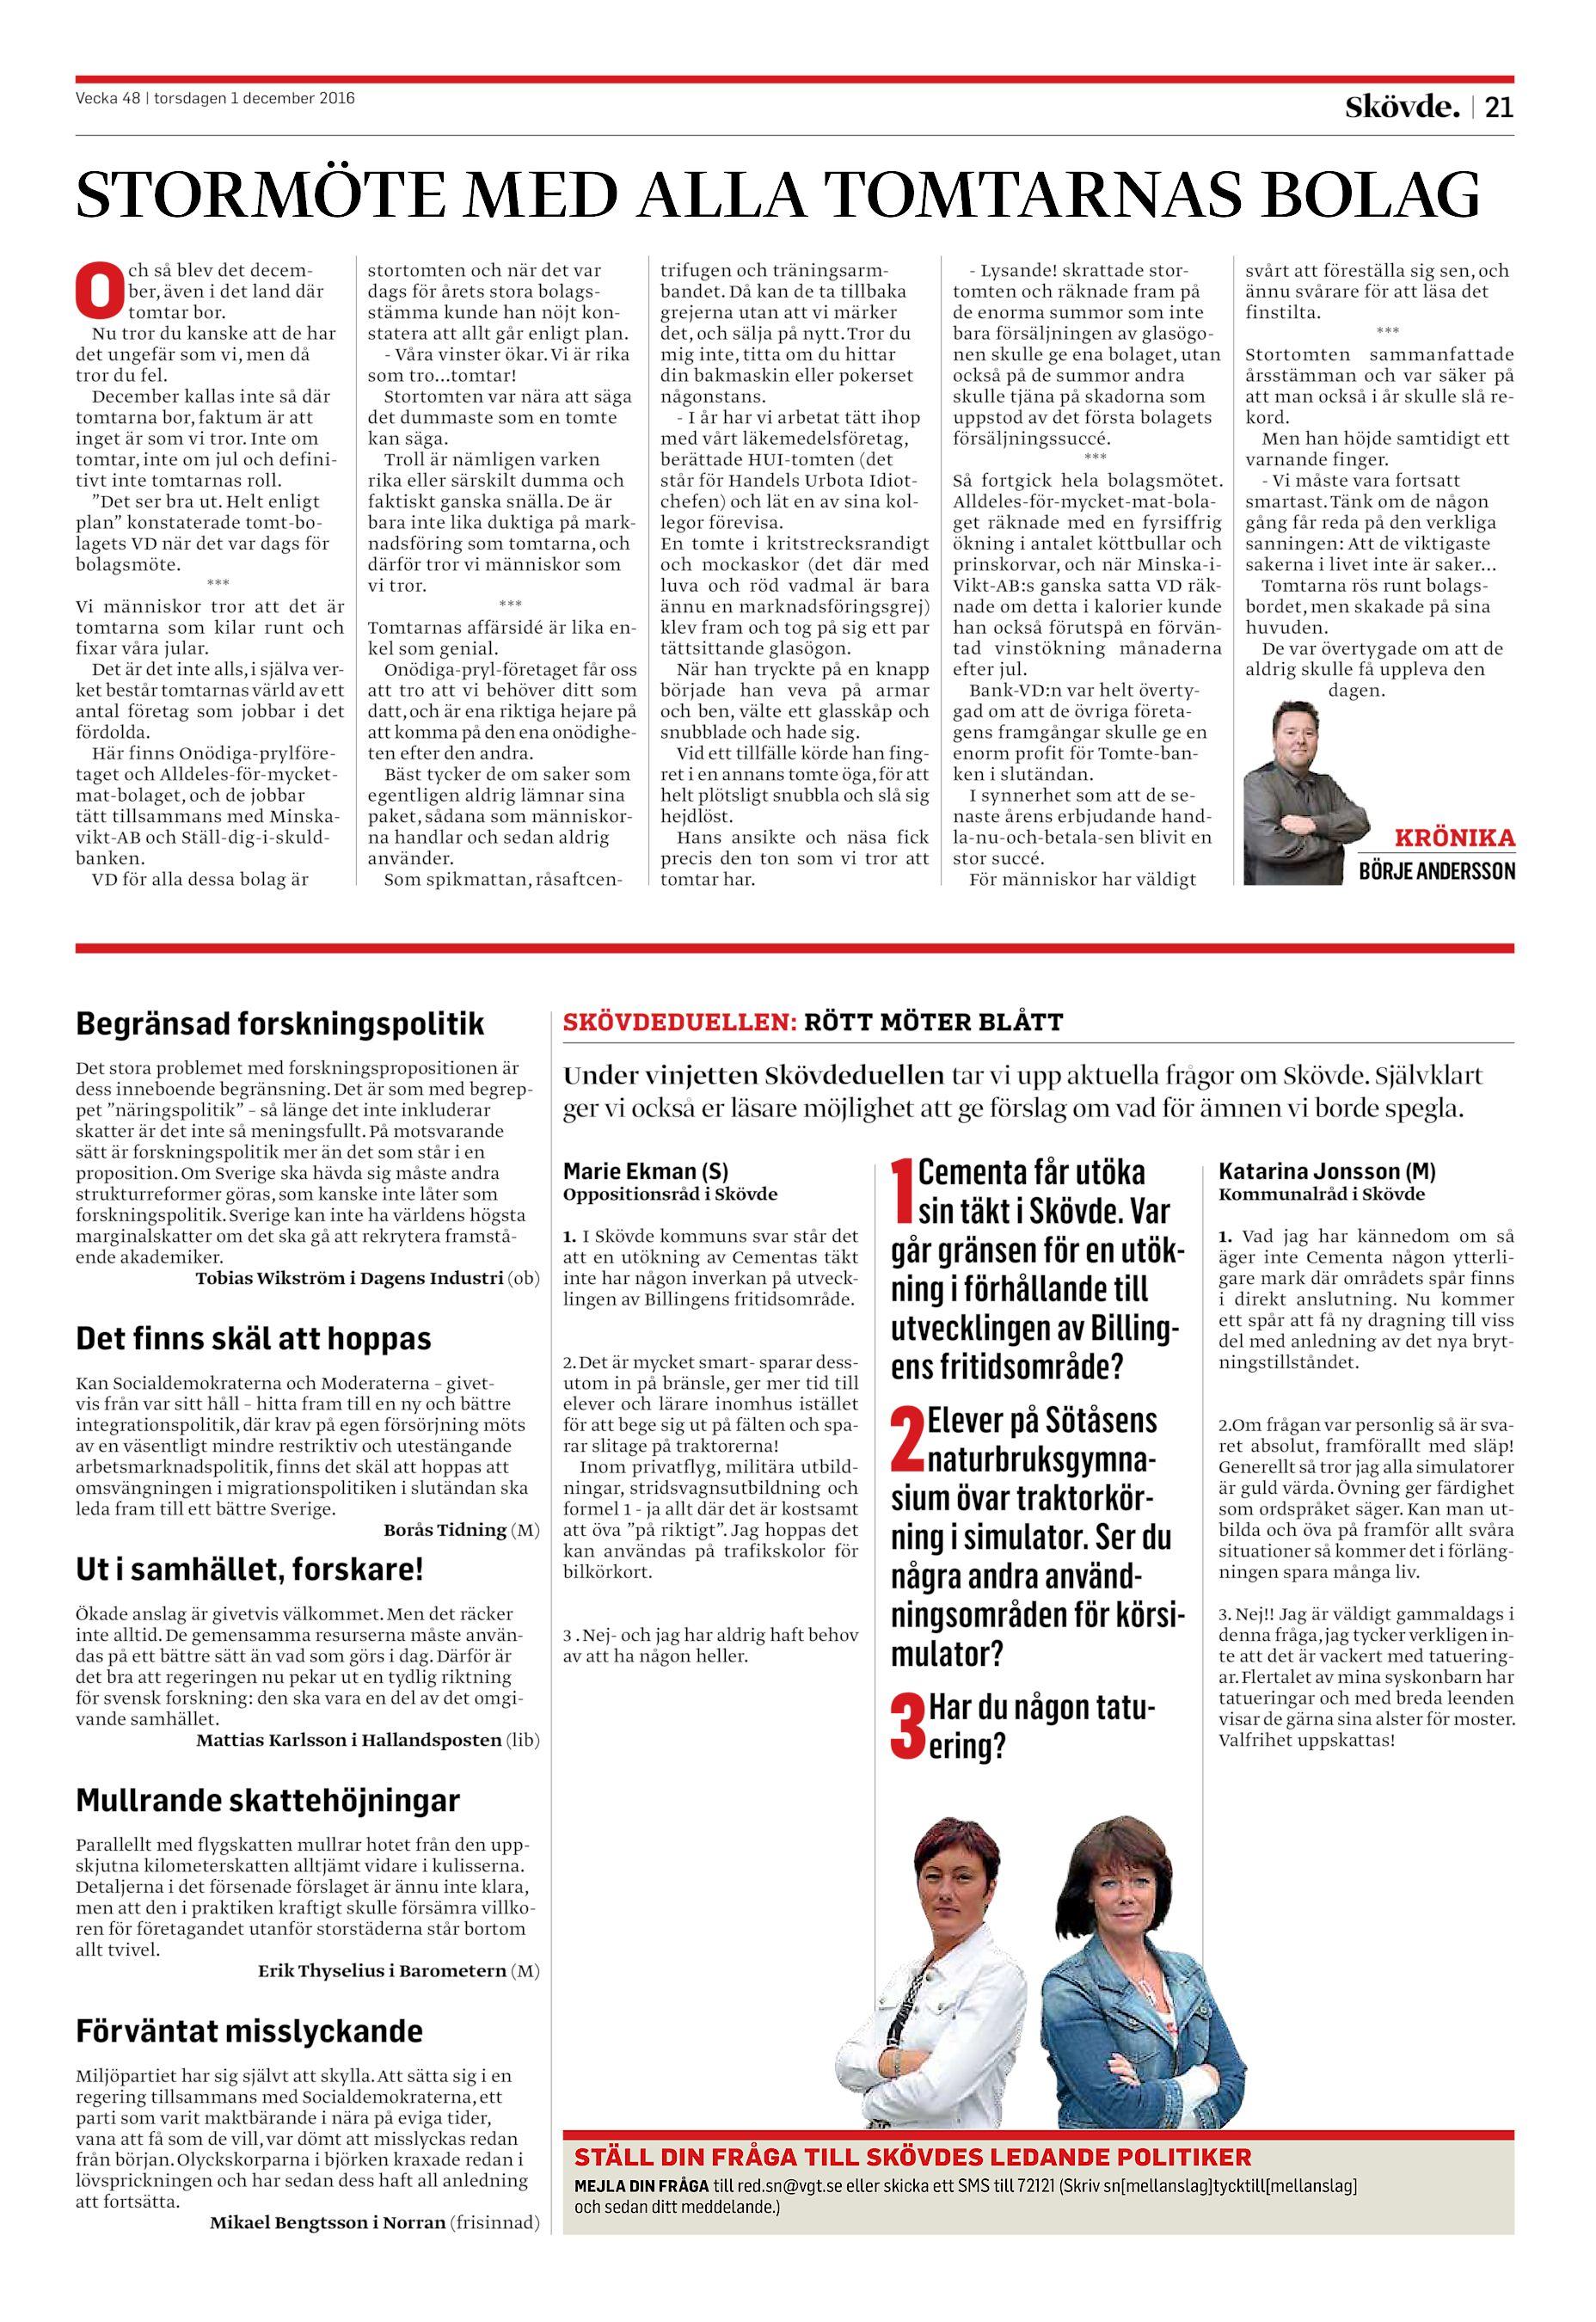 Skövde Nyheter SN-20161201 (endast text) 18331edf81ce4